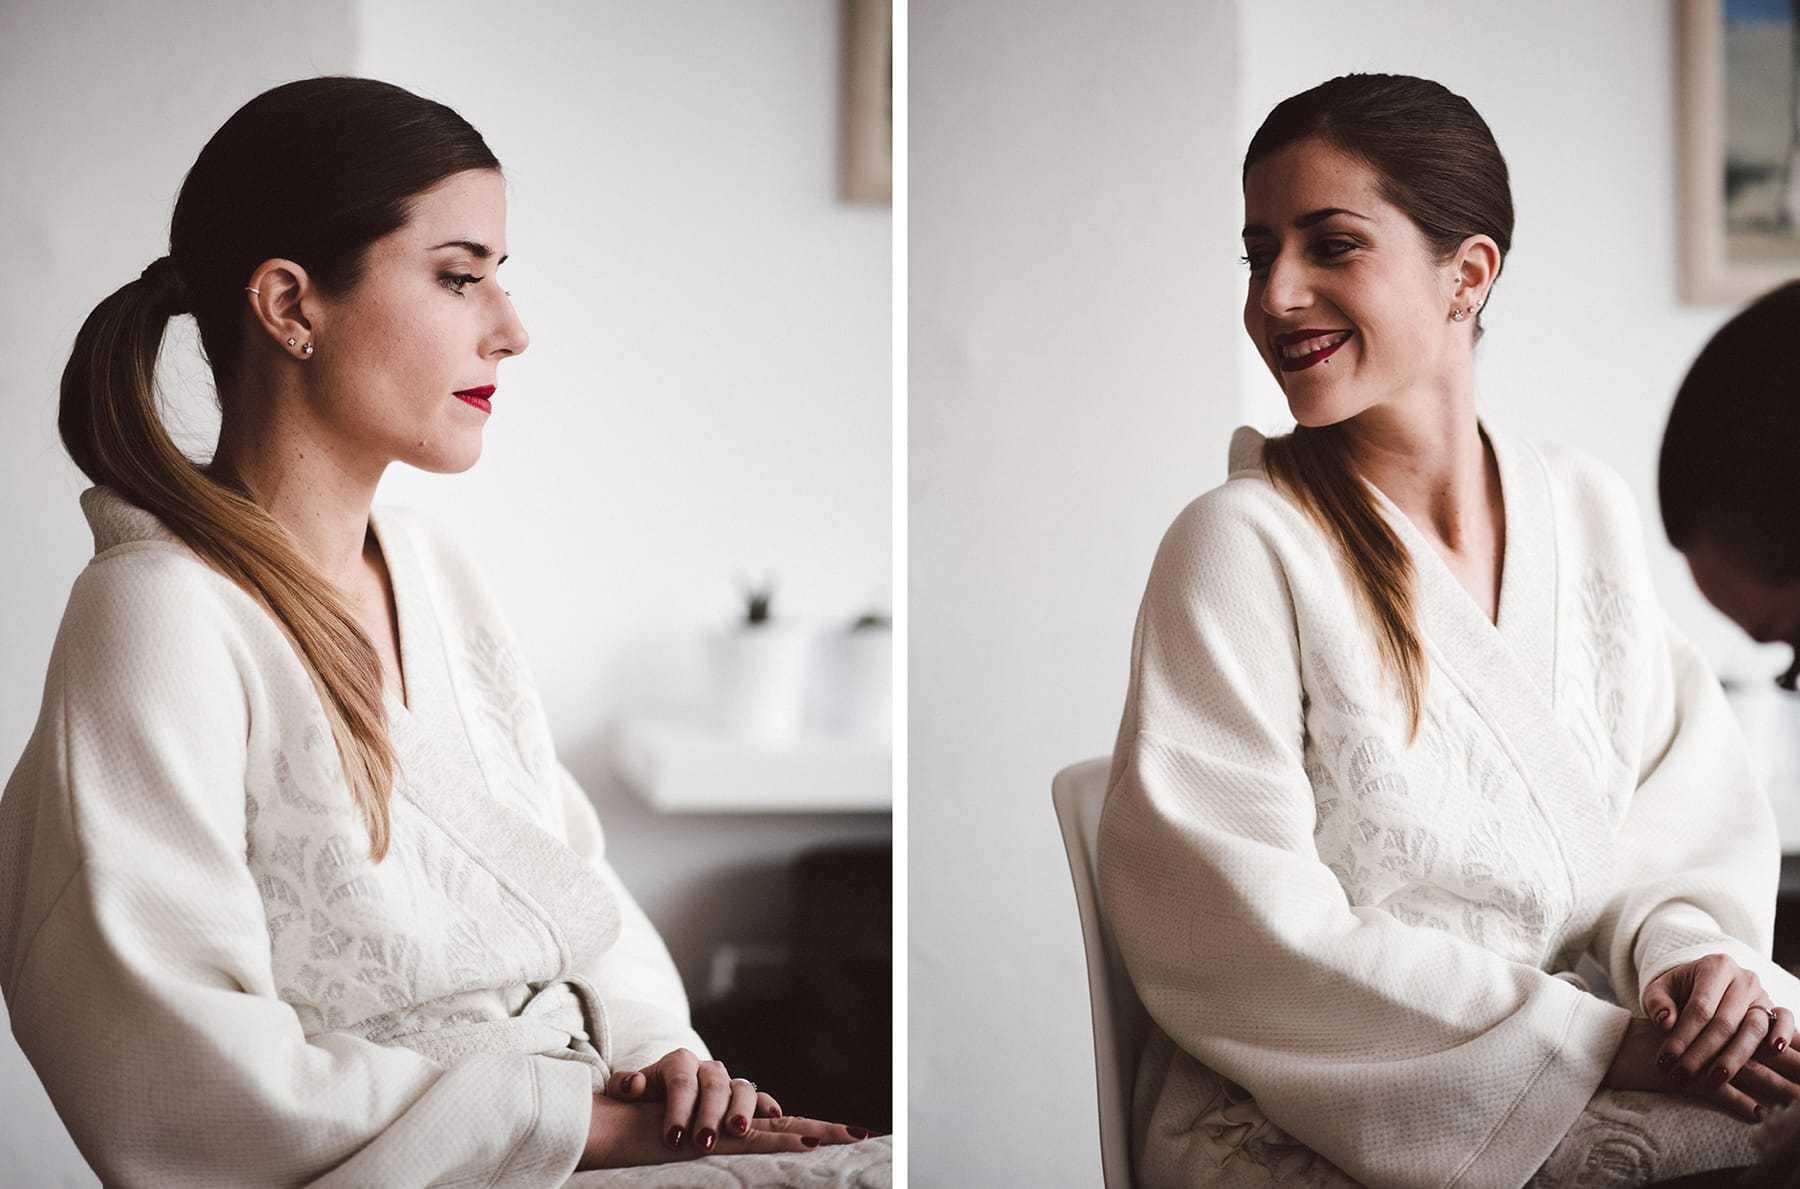 vestido_de_novia_otaduy_hilario_sanchez_fotografo_boda_barcelona_021